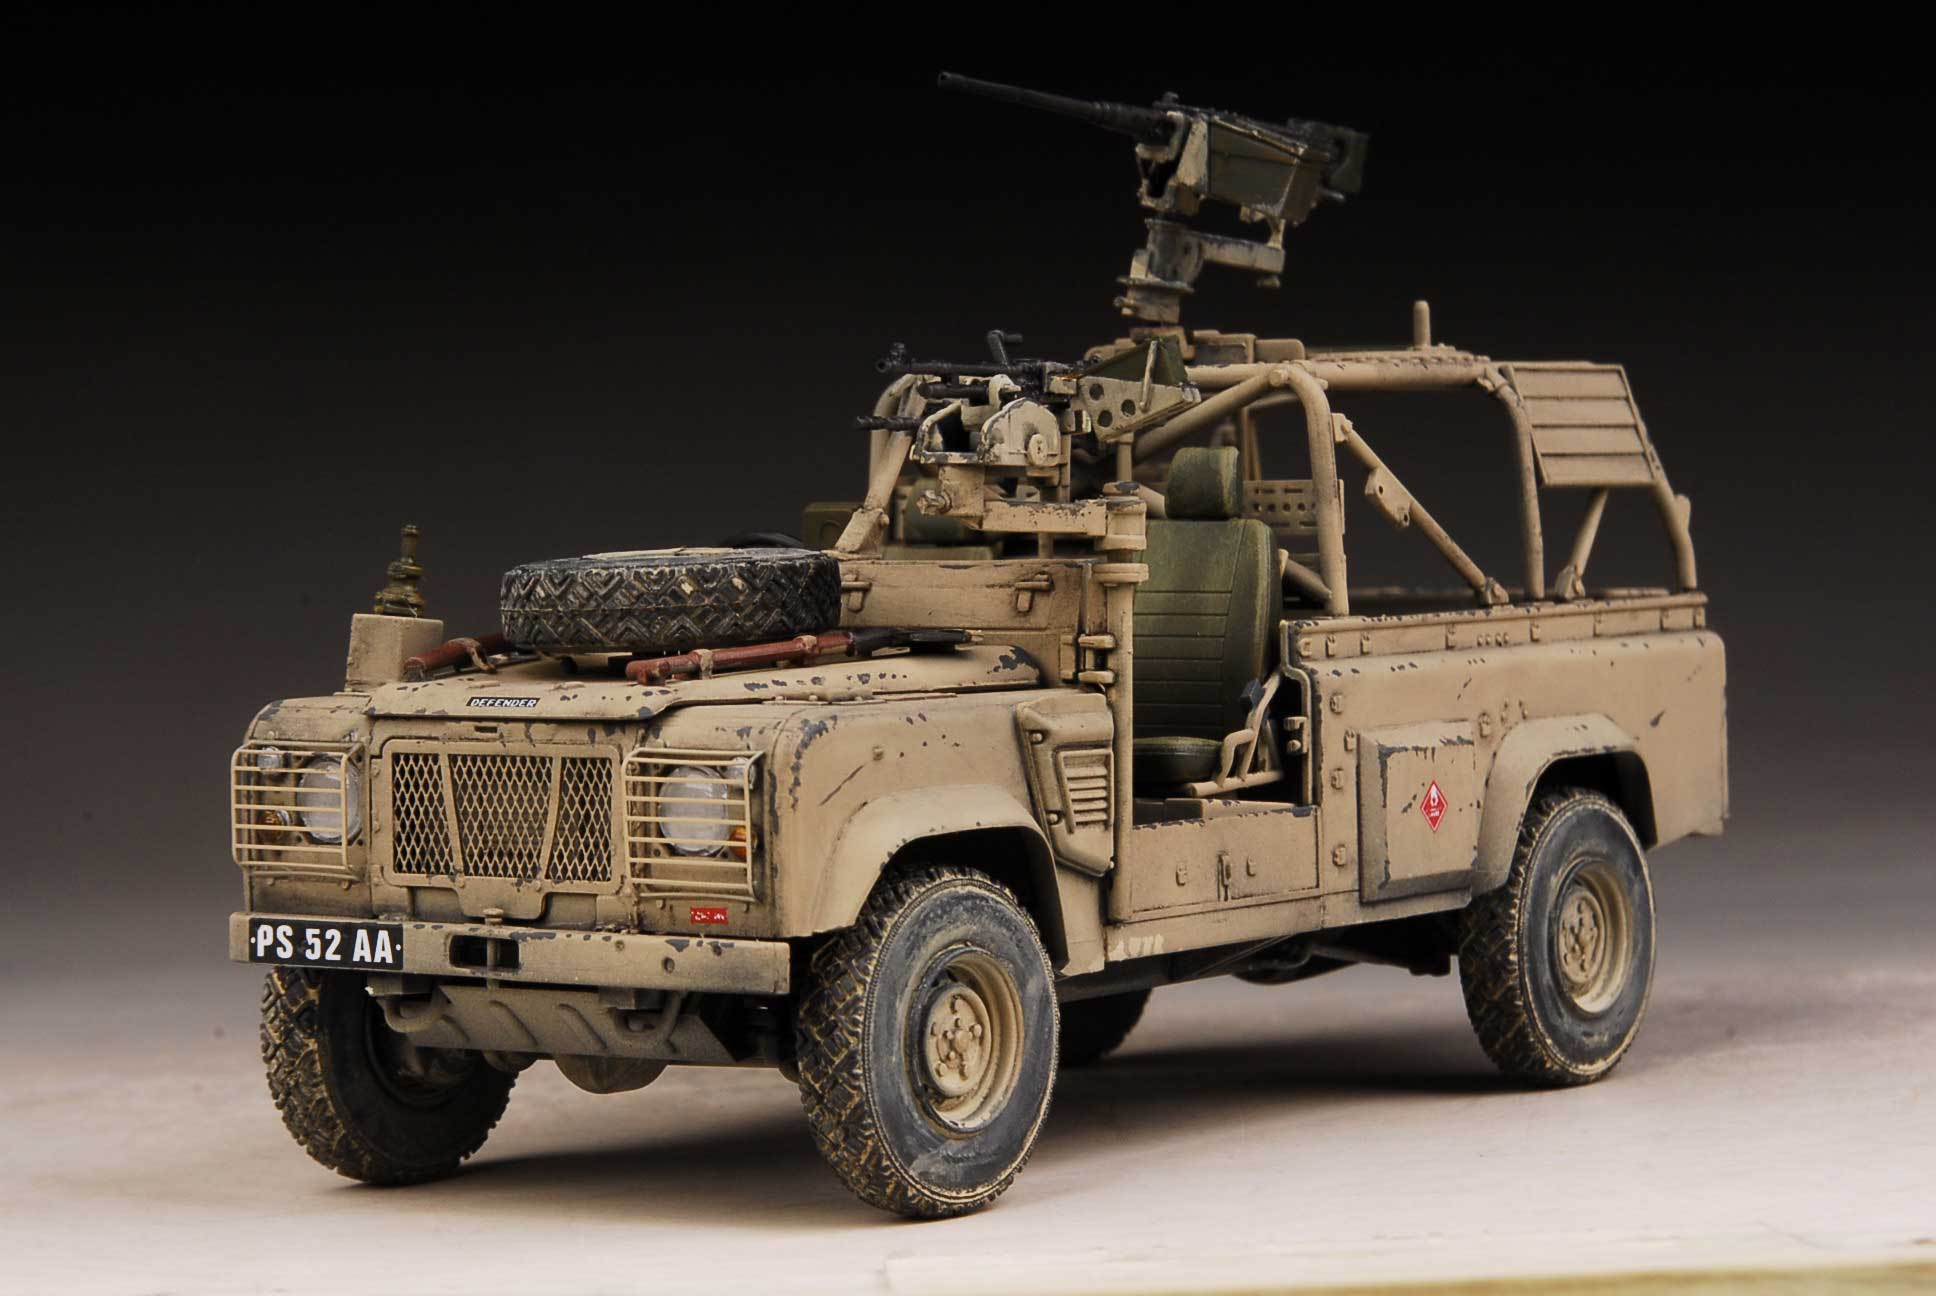 landrover zombie panther vehicle model rover sale land pink hunter pin for tamiya